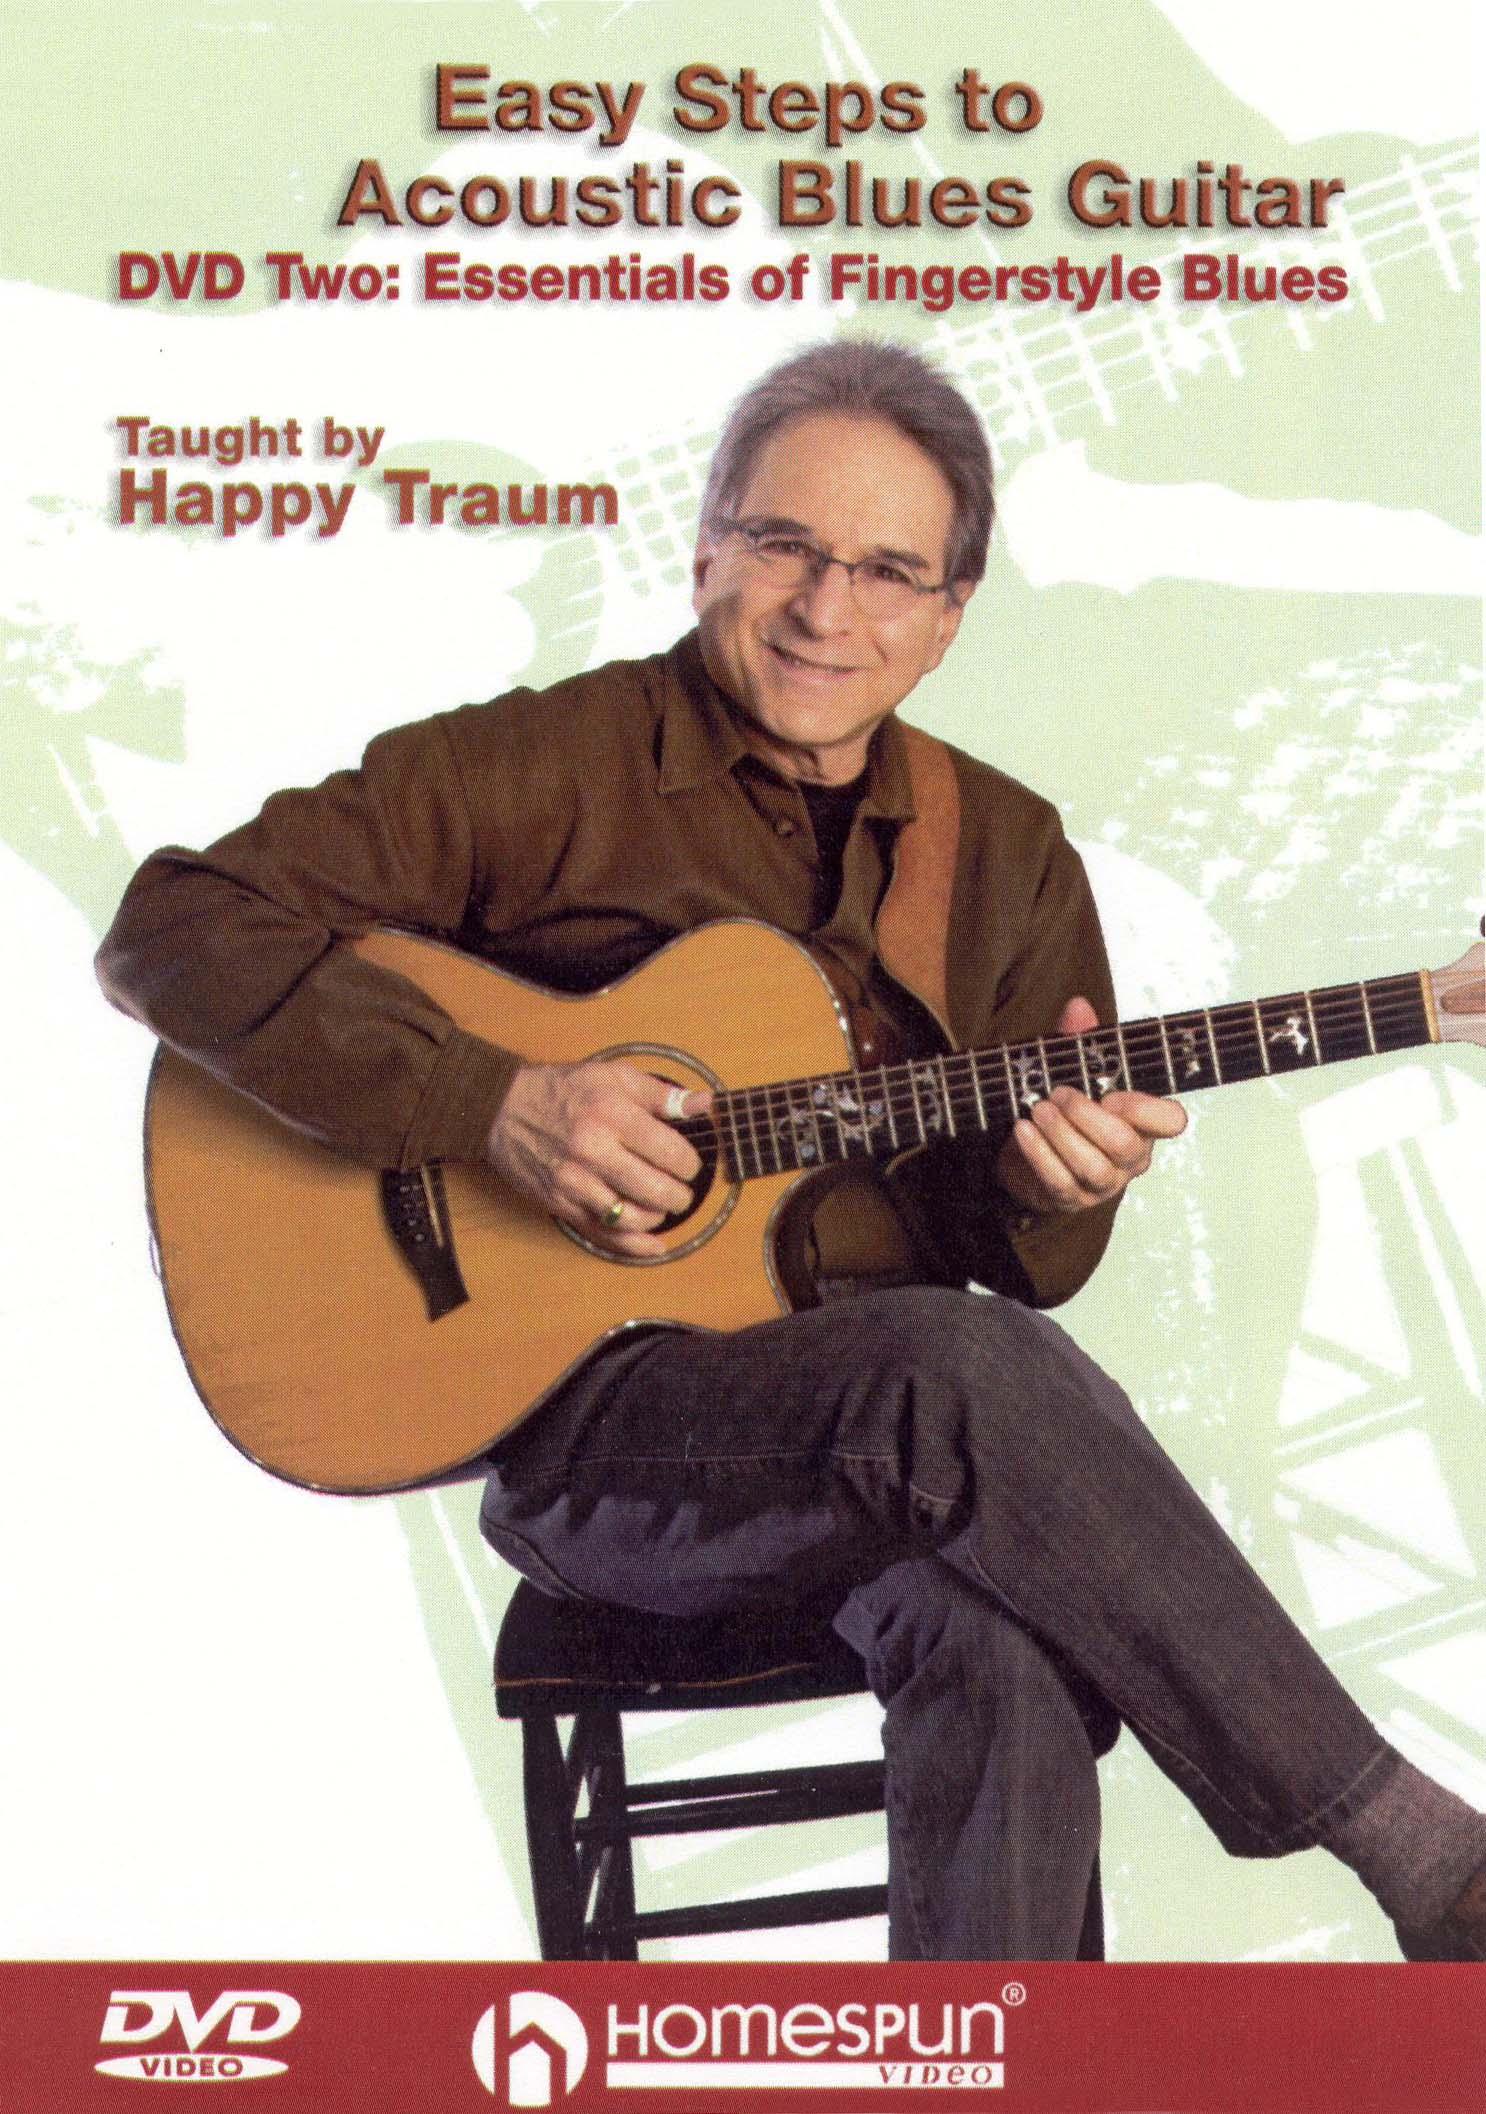 Happy Traum: Essentials of Fingerstyle Blues, Vol. 2